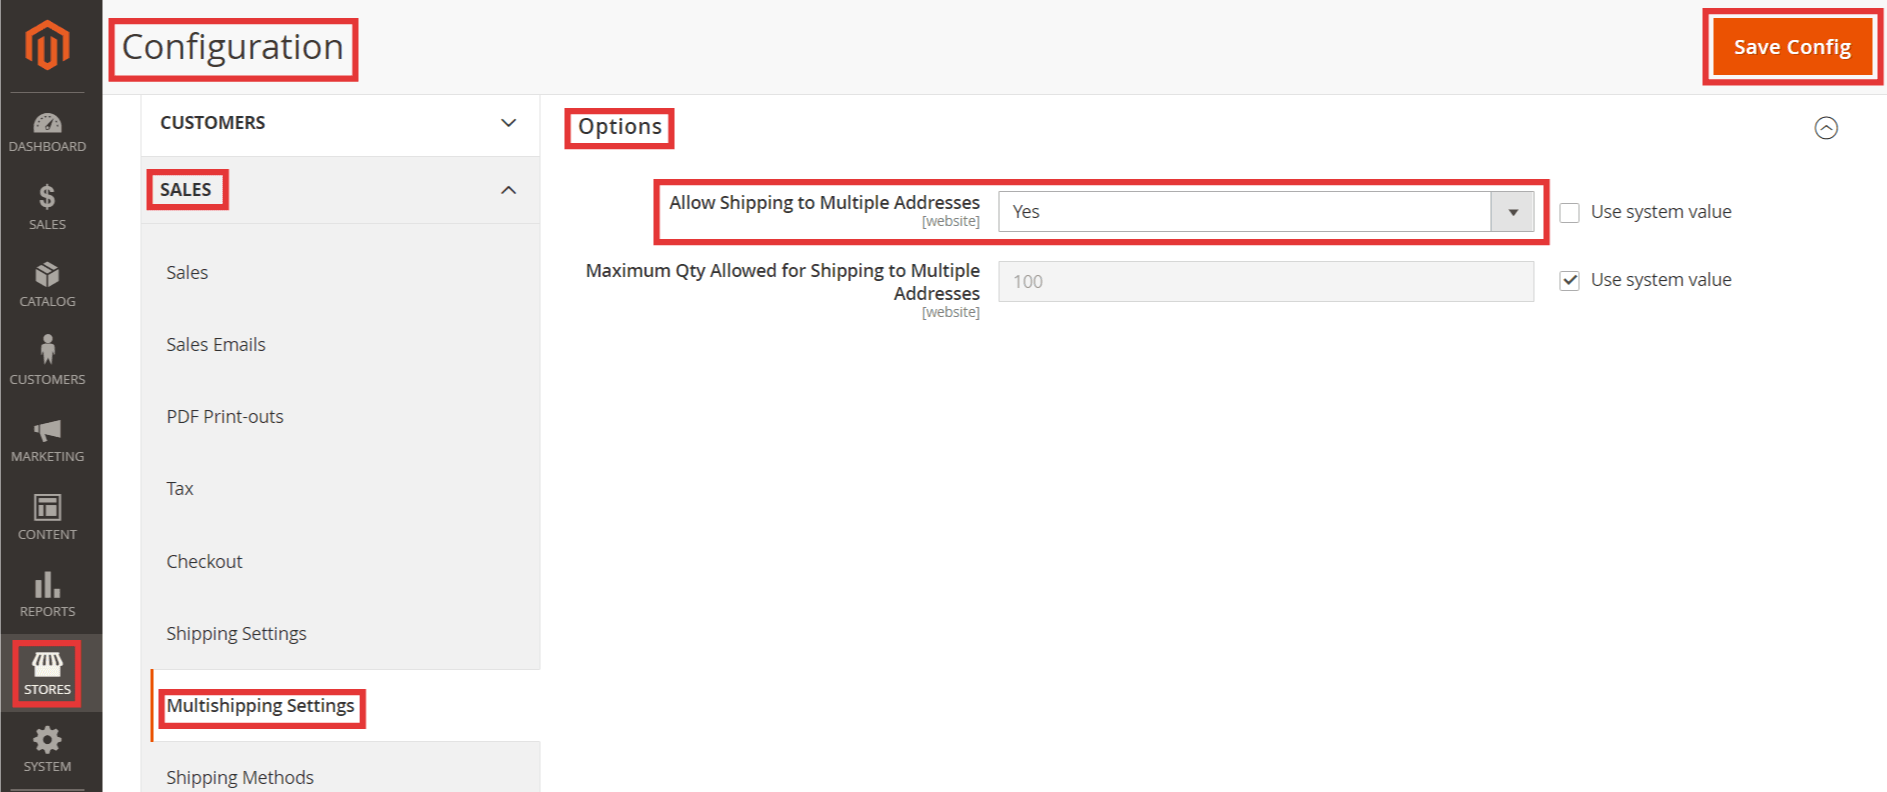 StepsConfigure Multiple Shipping Addresses in Magento 2